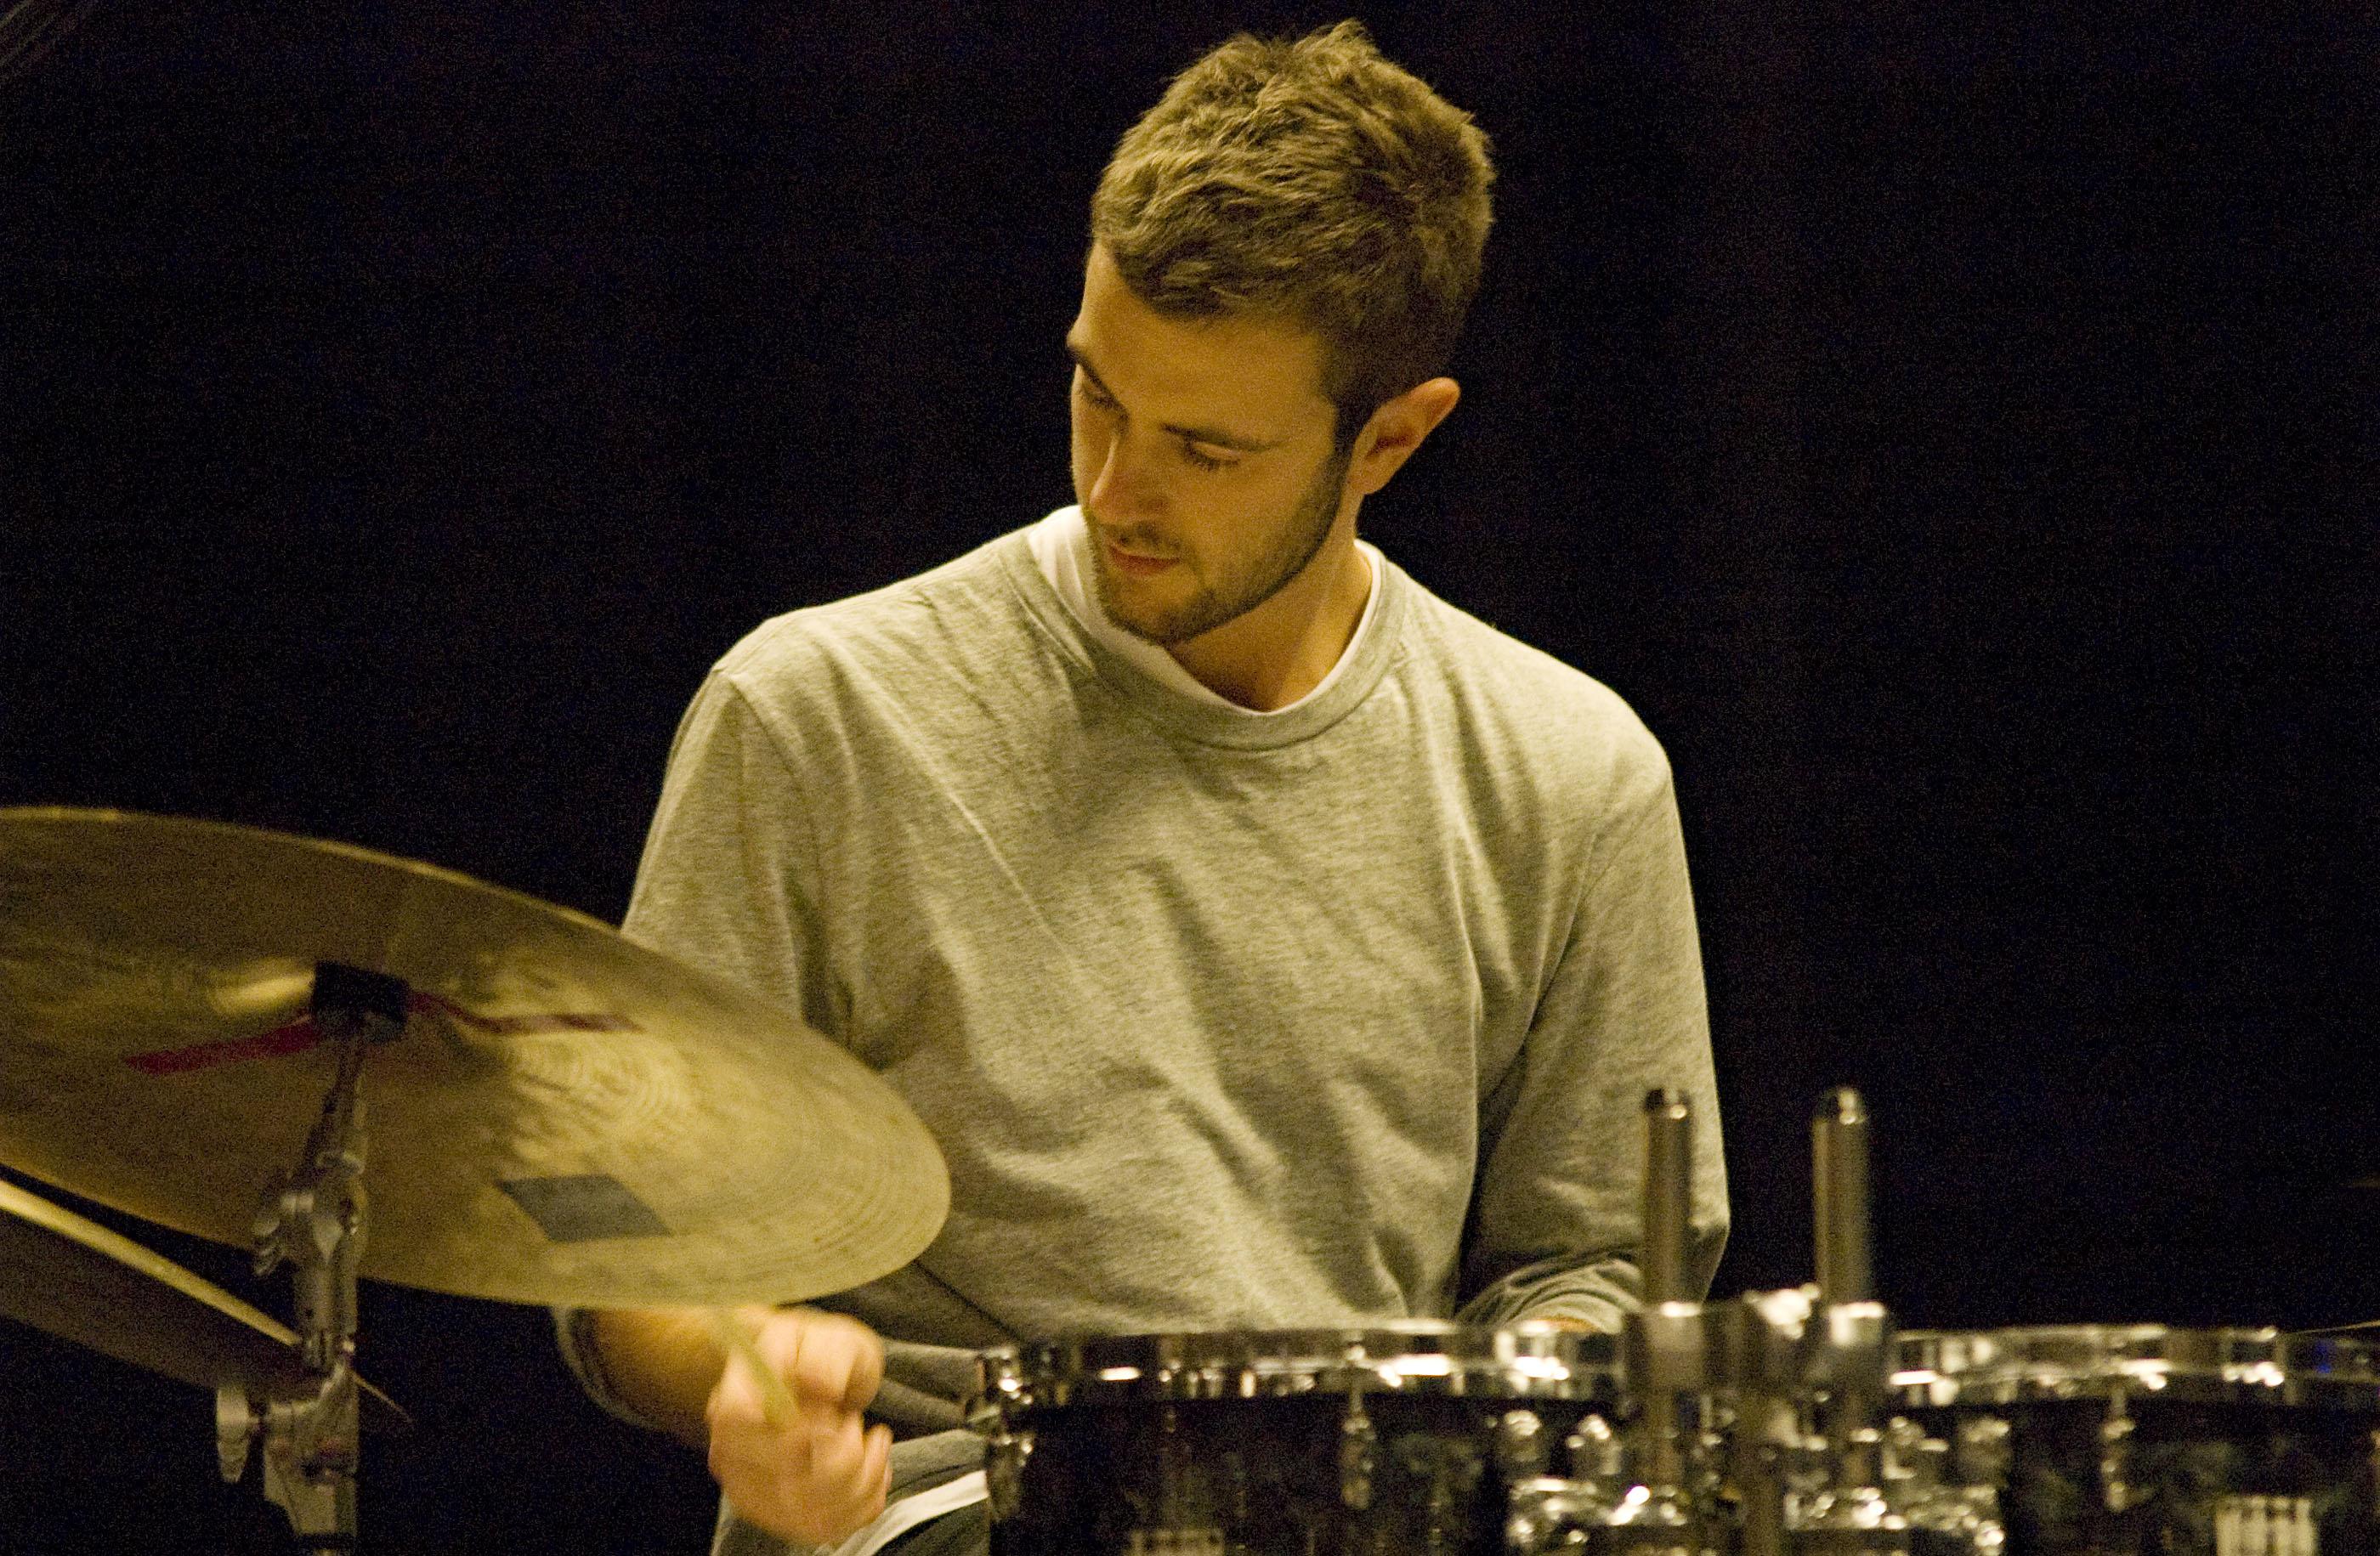 Duncan Bellamy of Portico Quartet, L'Astral, Montreal, Canada 10/02/2010